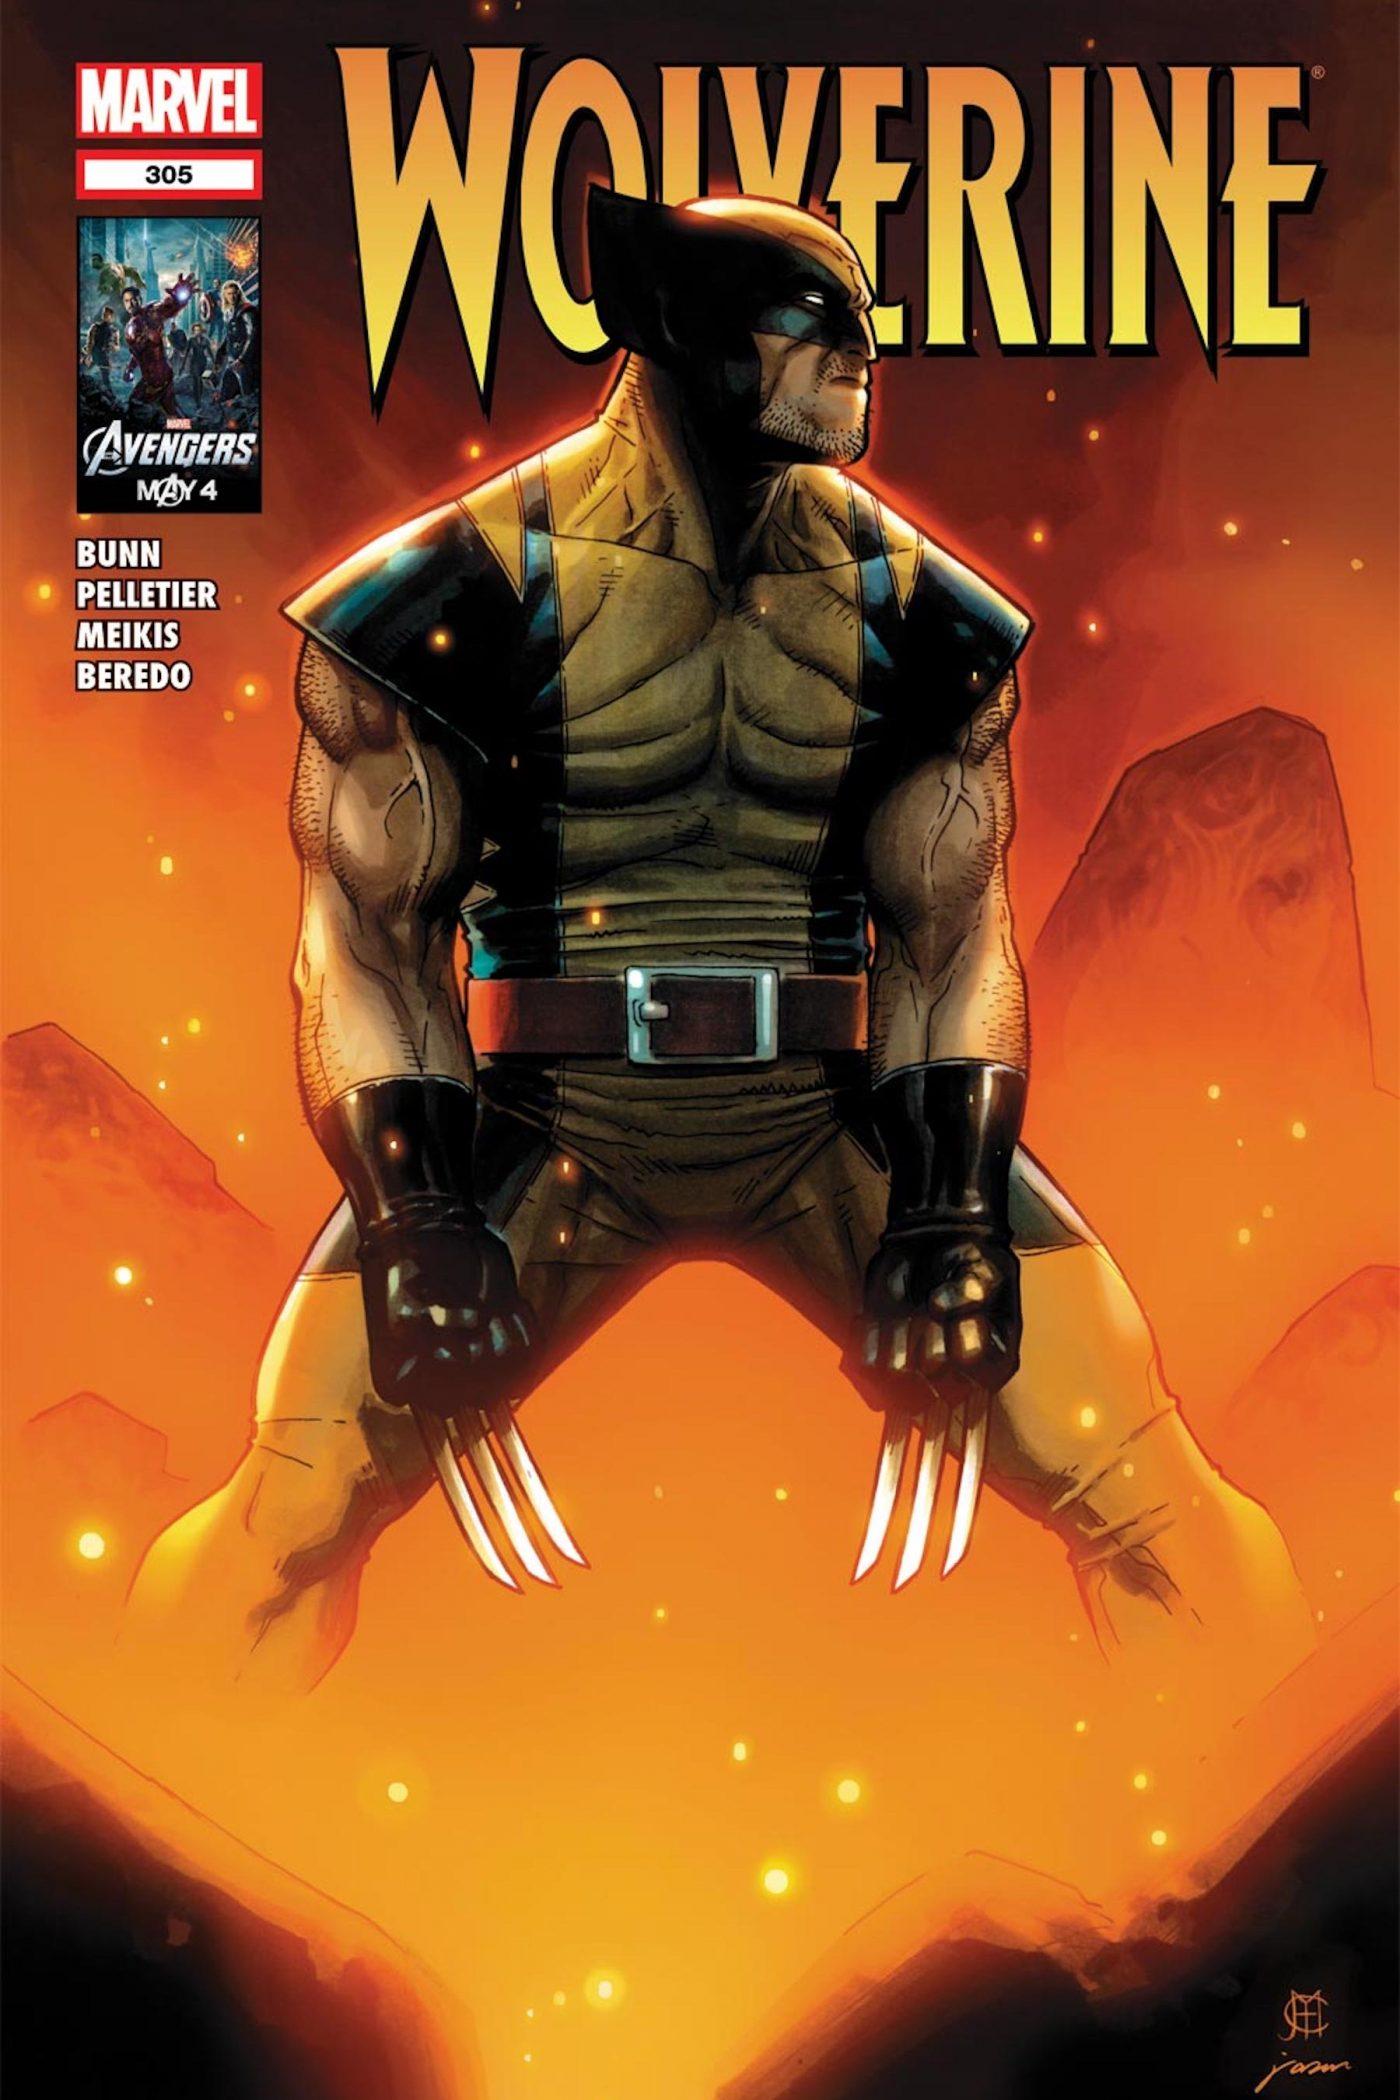 Wolverine #305, copertina di Jason Keith e Jim Cheung